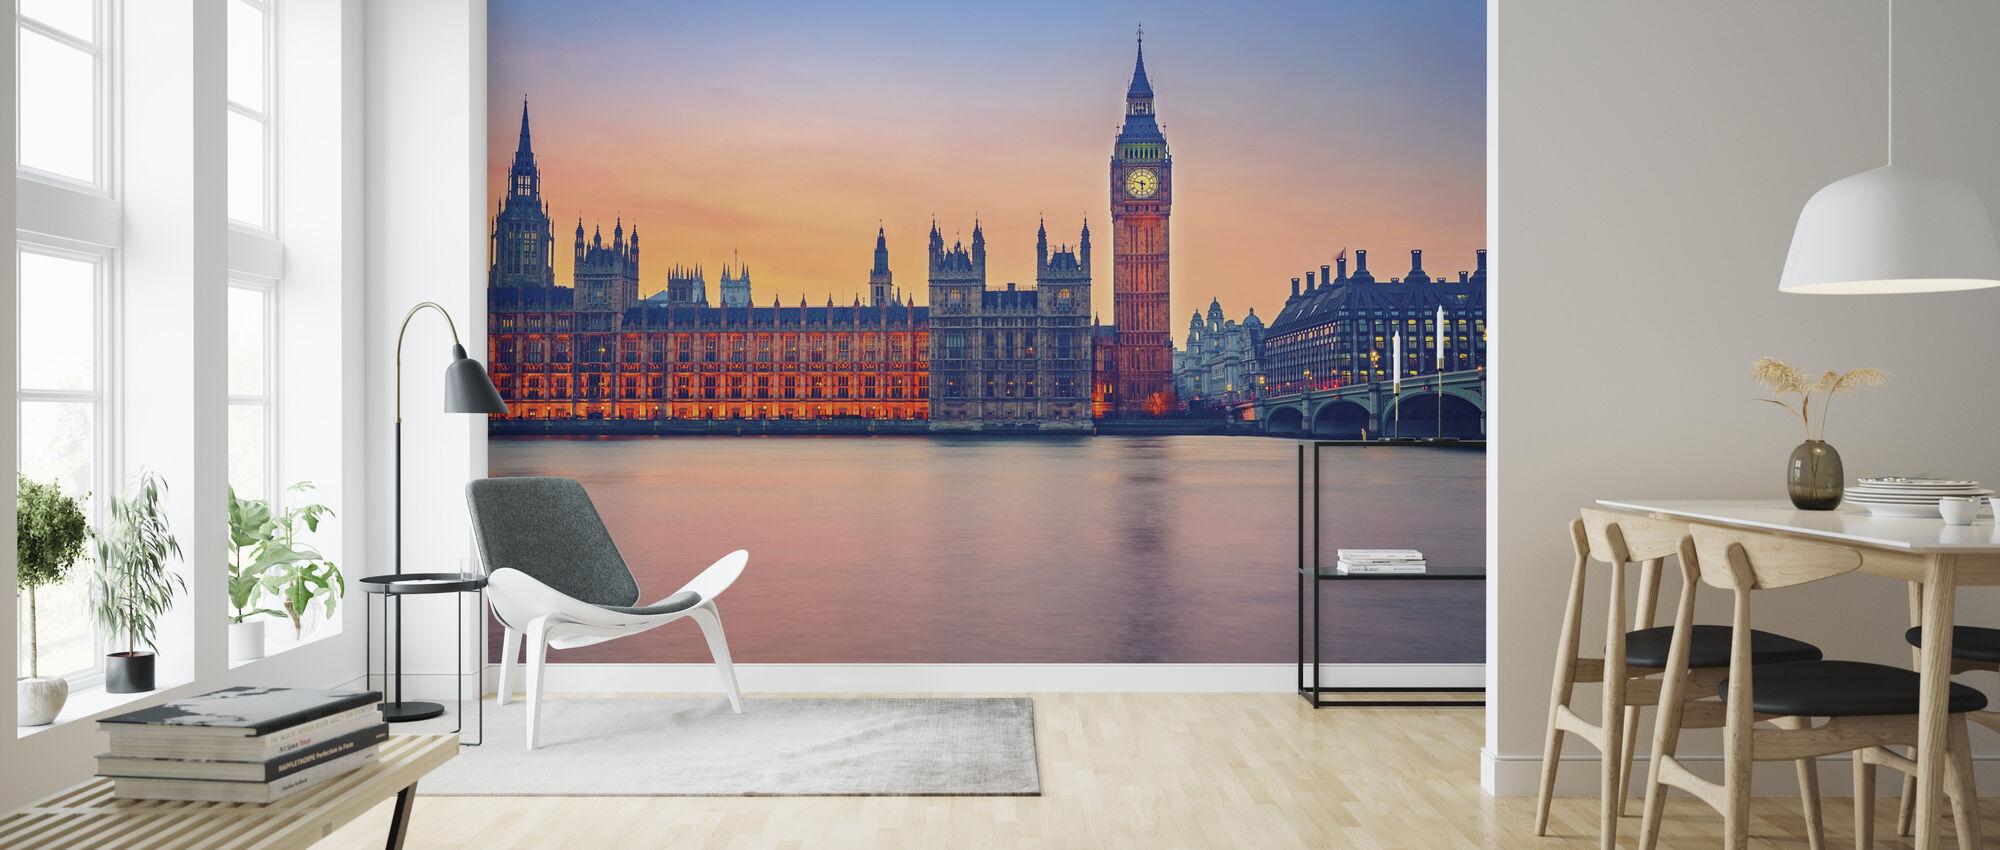 Big Ben and Houses of Parliament - Wallpaper - Living Room